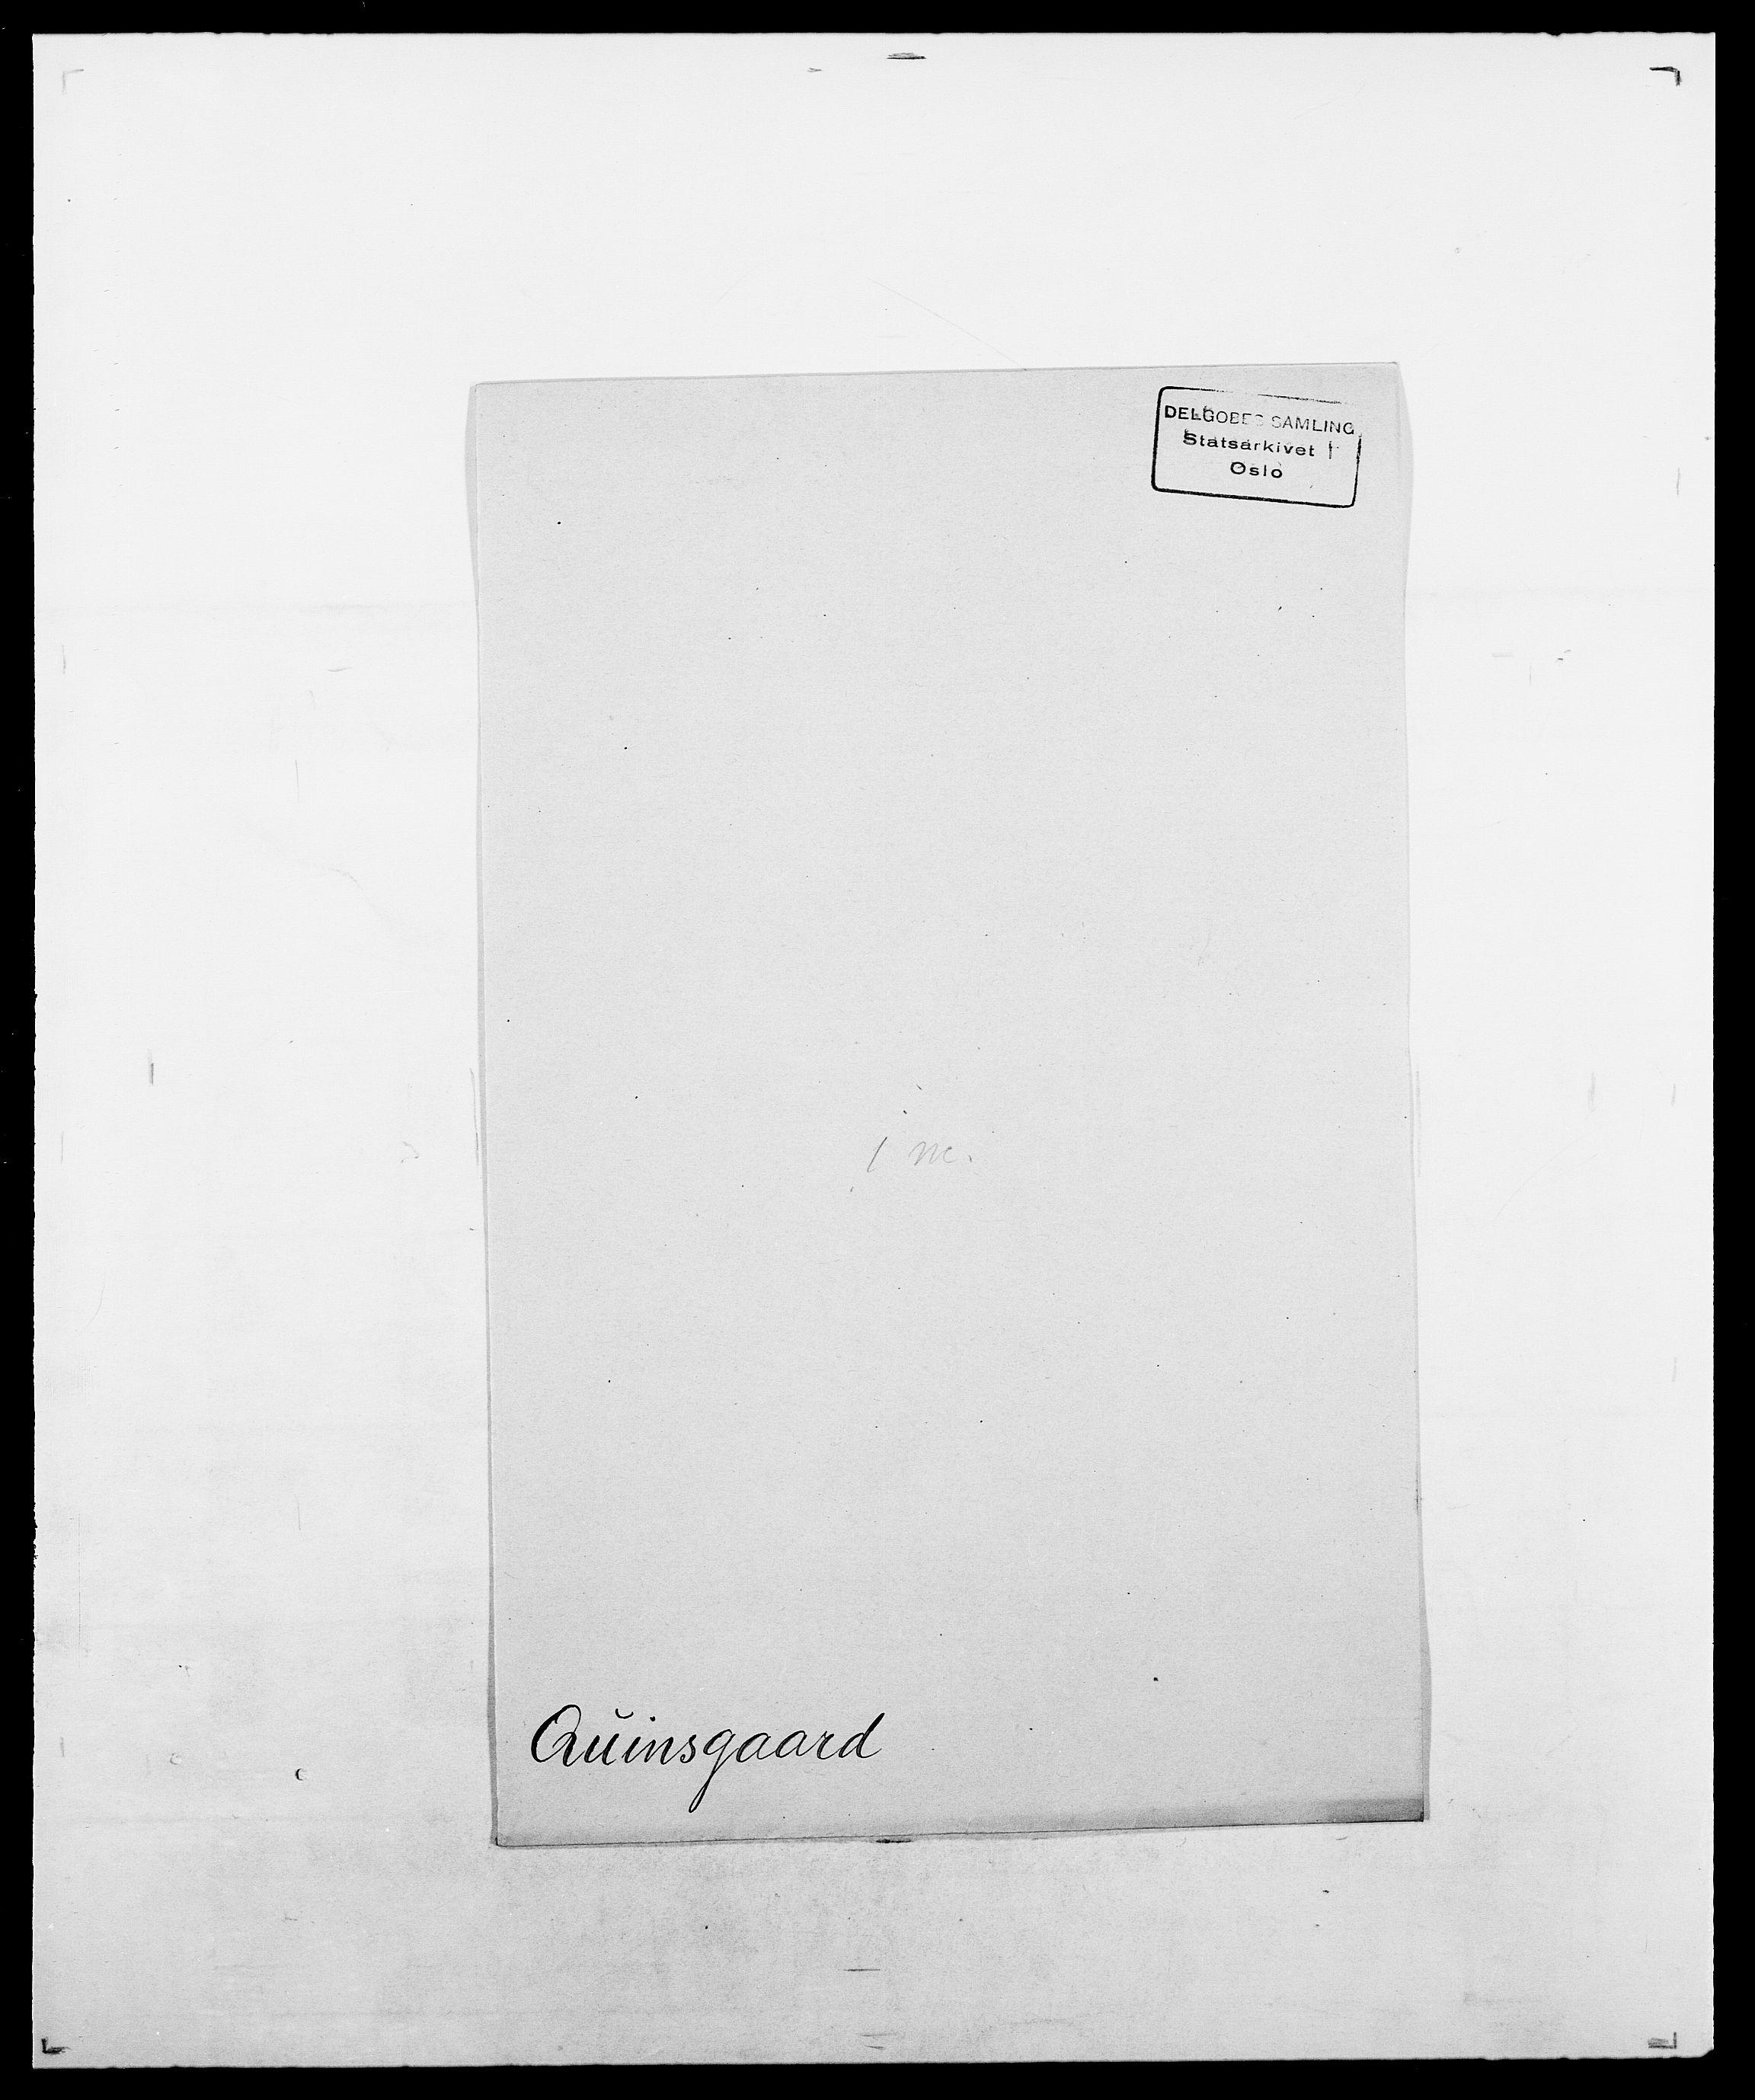 SAO, Delgobe, Charles Antoine - samling, D/Da/L0031: de Place - Raaum, s. 482